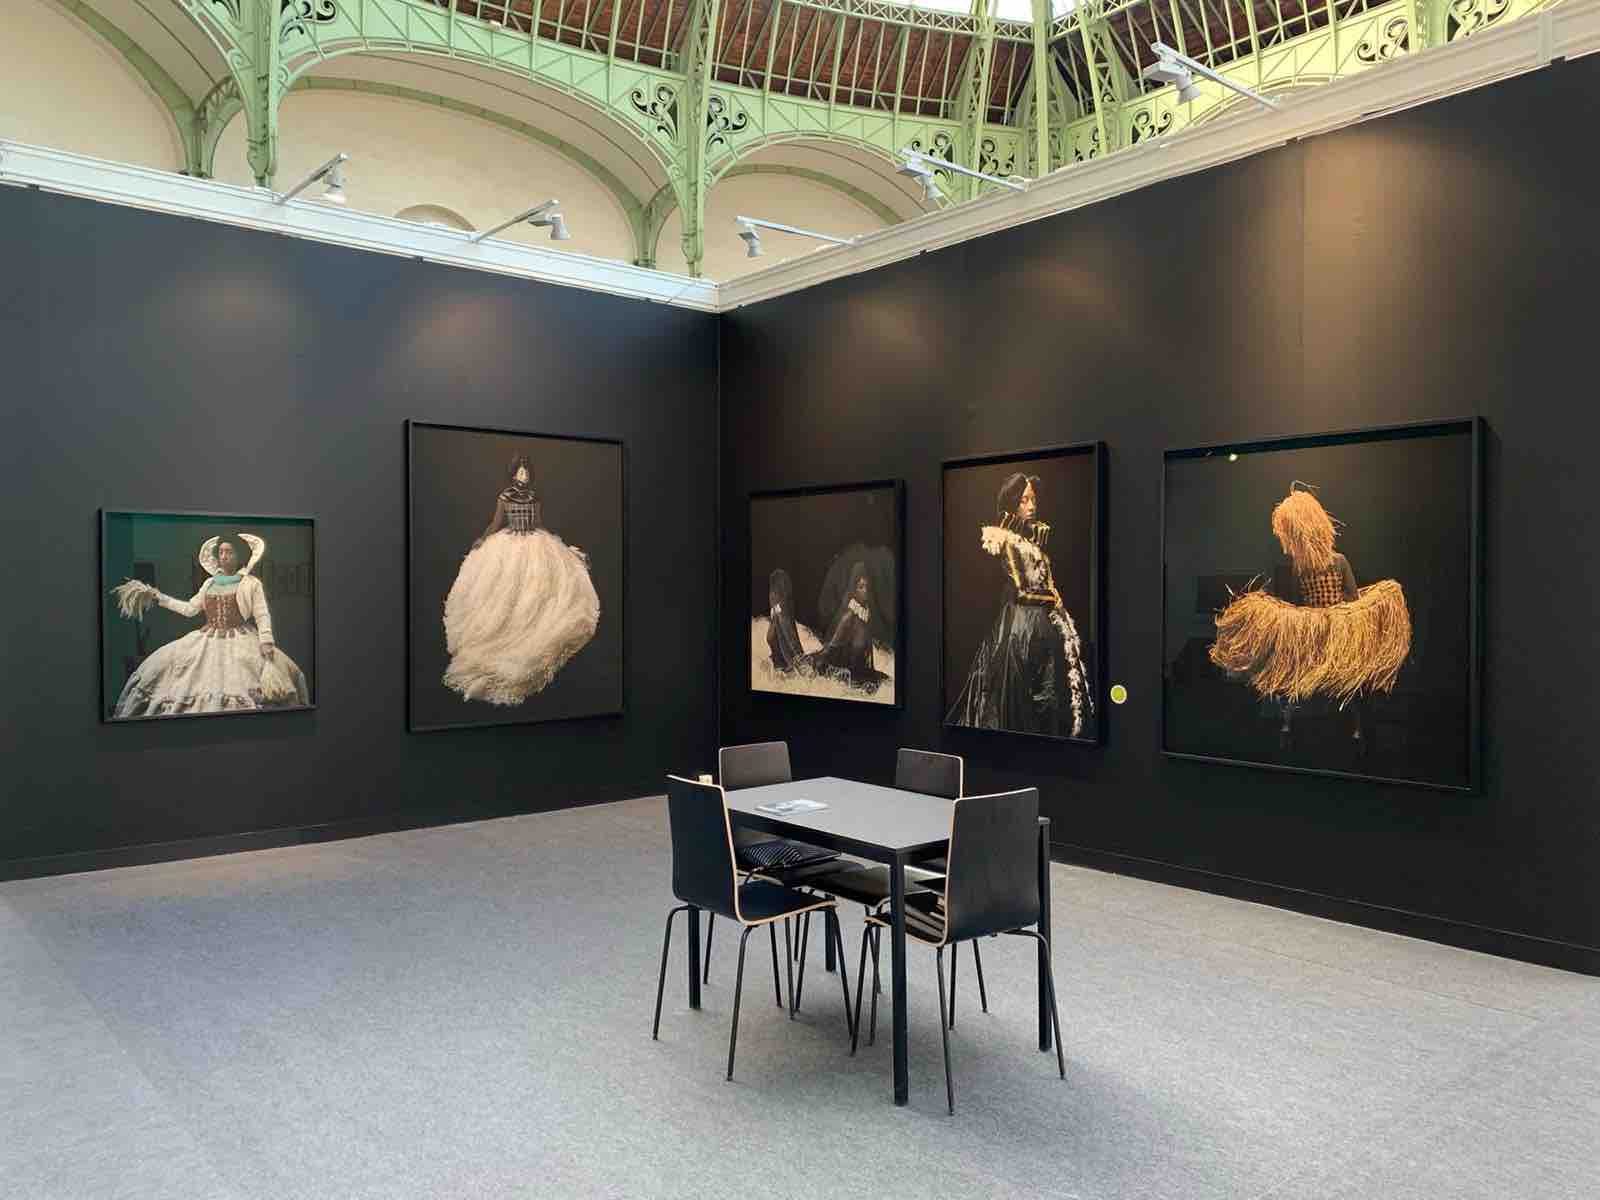 Installation Gallery Mariane Ibrahim, Paris Photo 2019 © Photos Ayana V. Jackson and Gallery Mariane Ibrahim Chicago